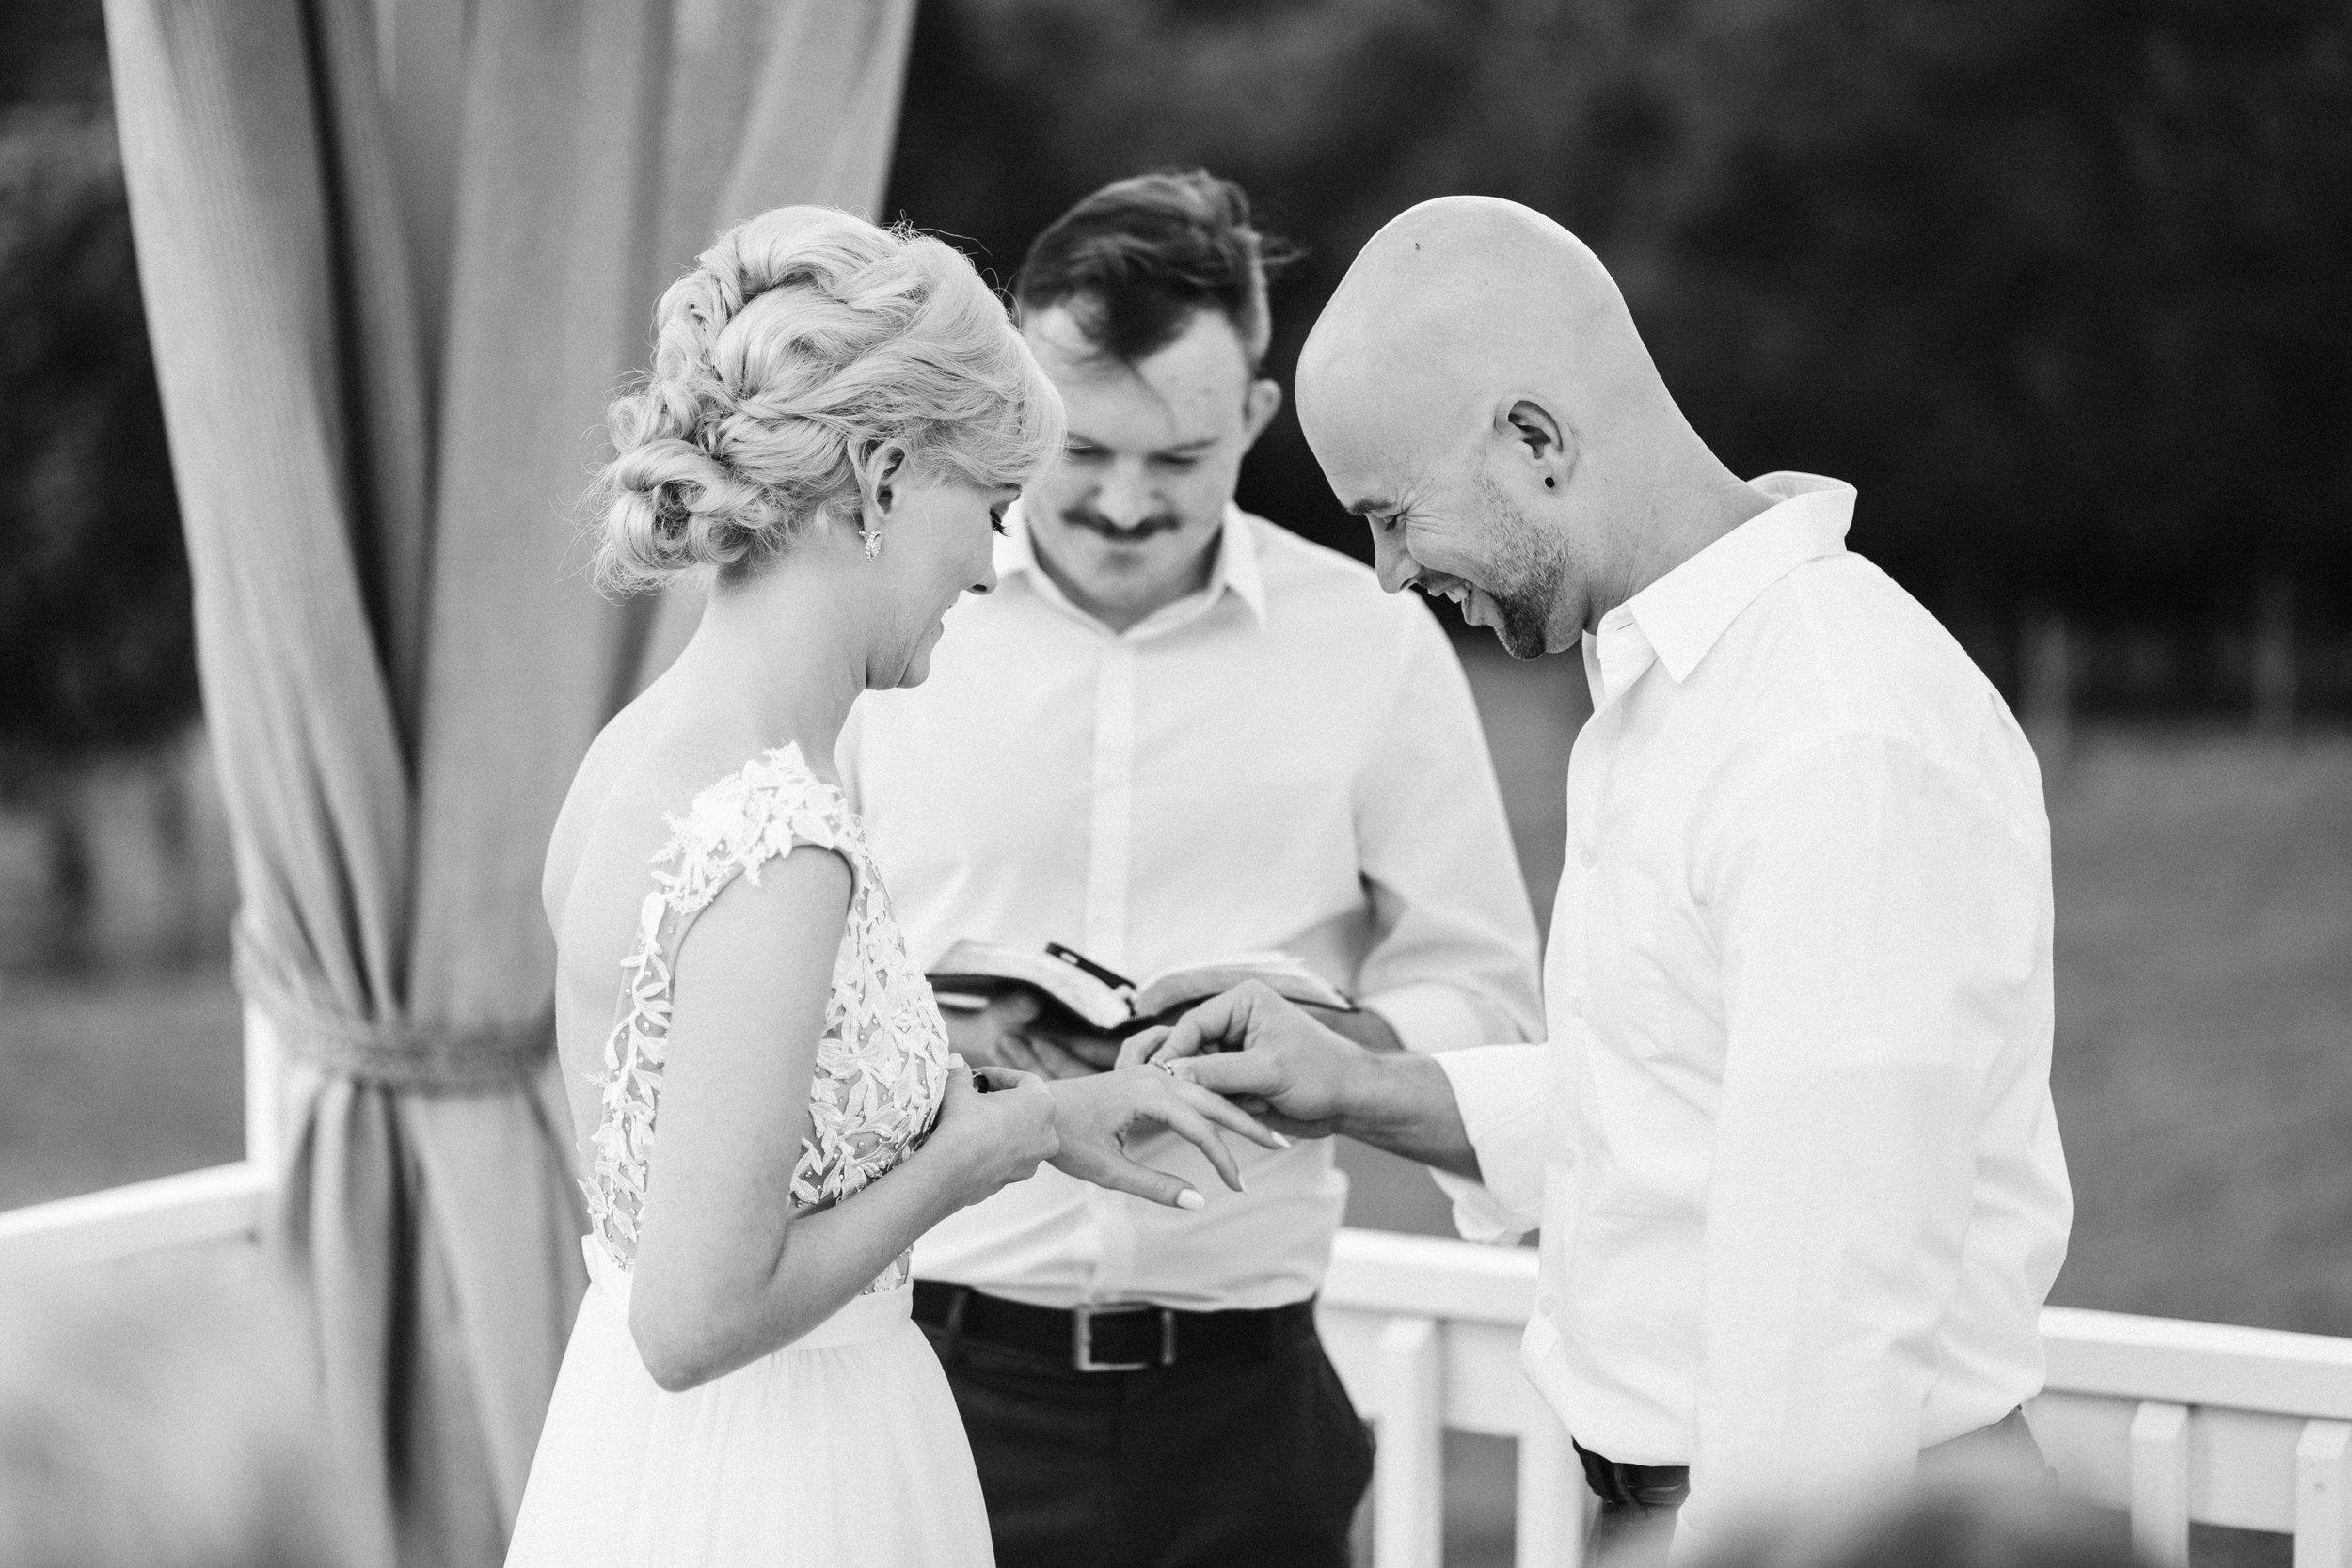 2018.09.02 Ray and Sarah Prizner Nashville TN Wedding FINALS-290.jpg